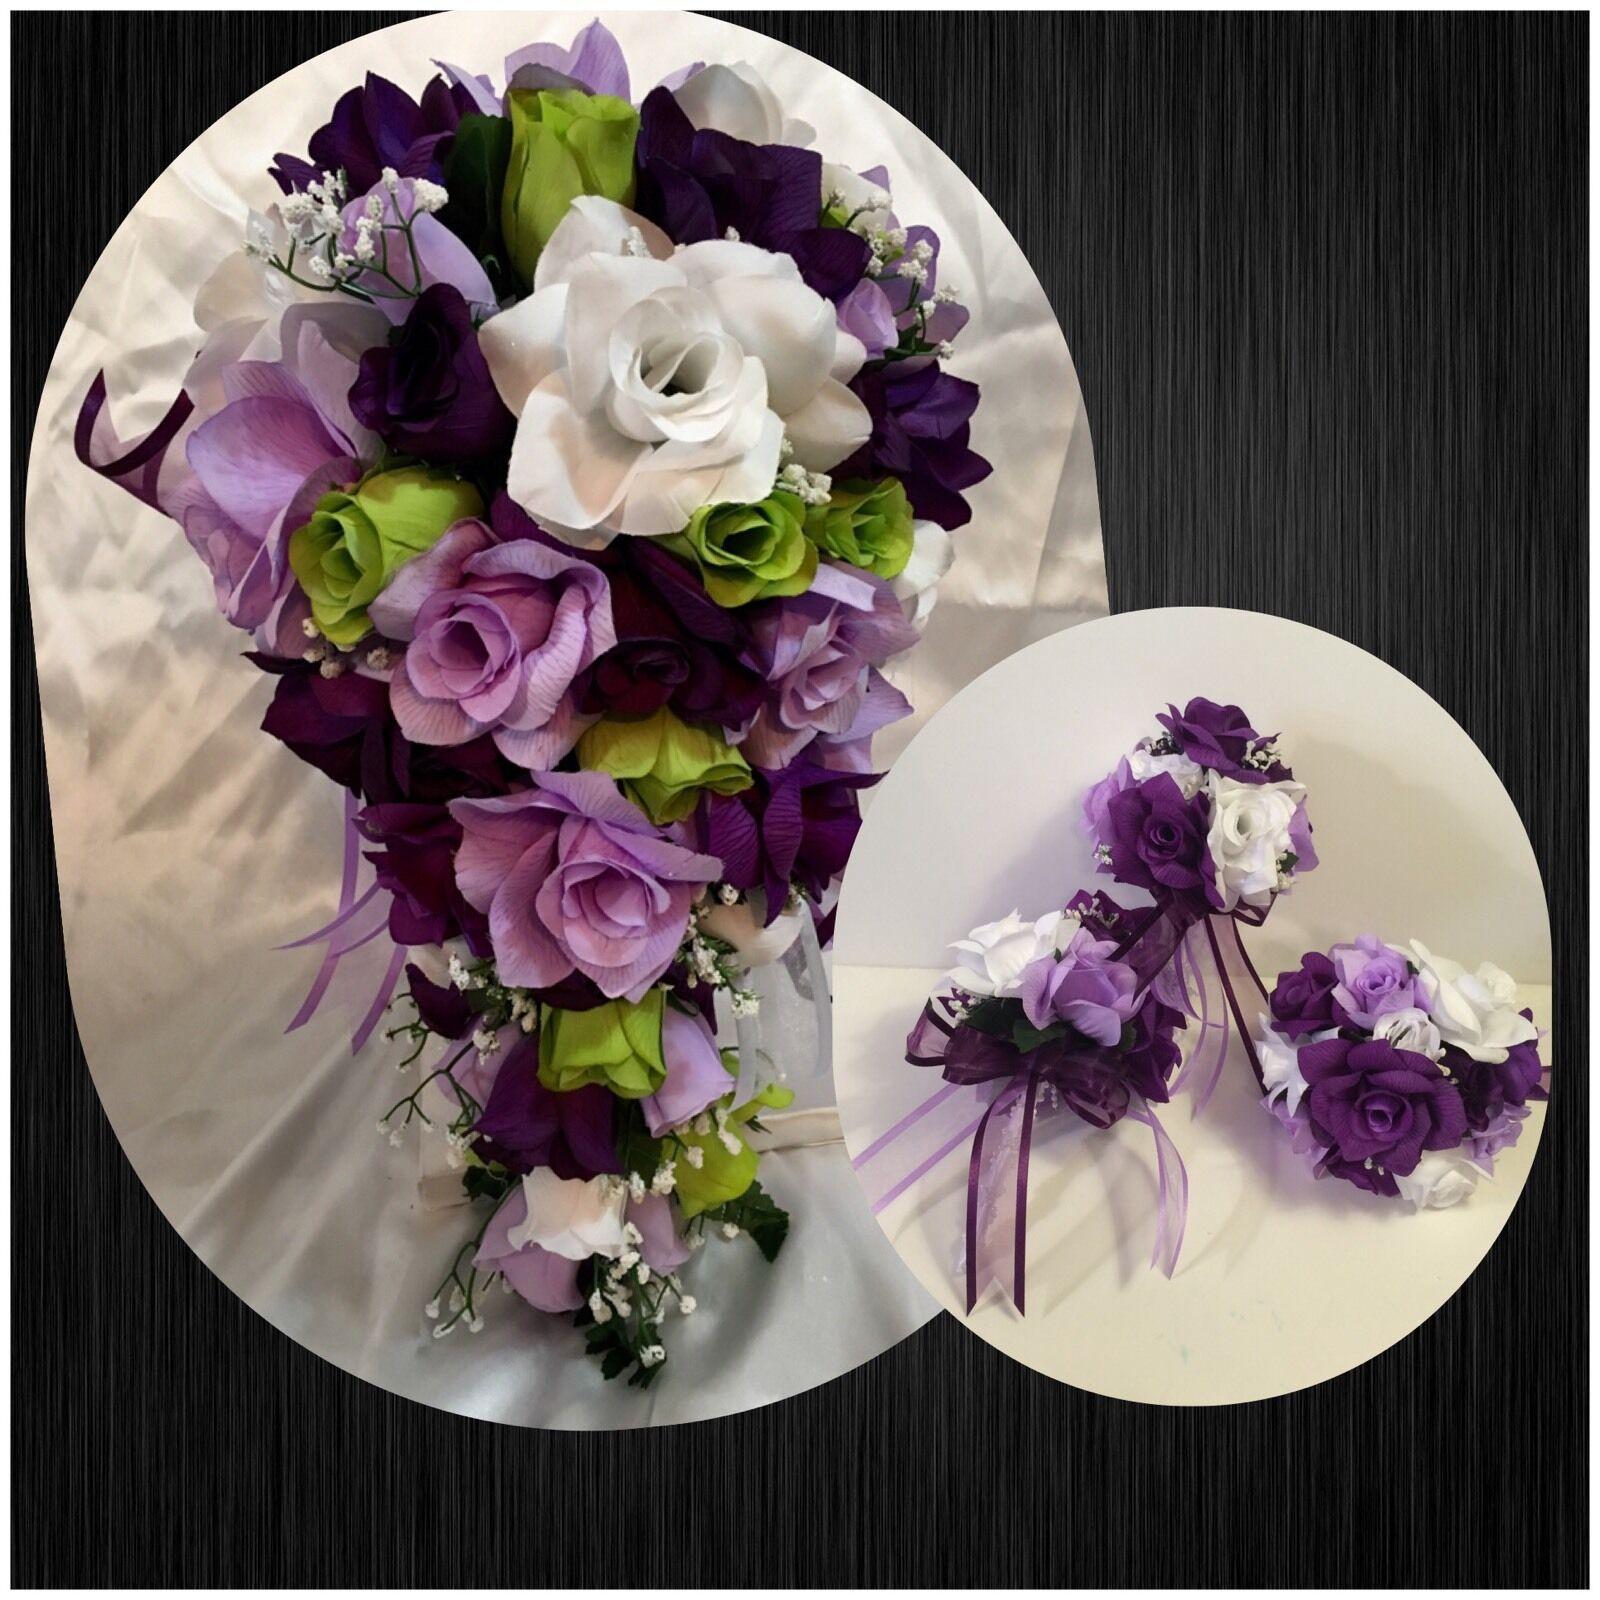 Wedding Bridal Bouquet Package Lavender Purple Green Silk Wedding Flowers  - Wedding Bouquets - Ideas of Wedding Bouquets #wedding #bouquets #weddingbouquets #bridalbouquetpurple